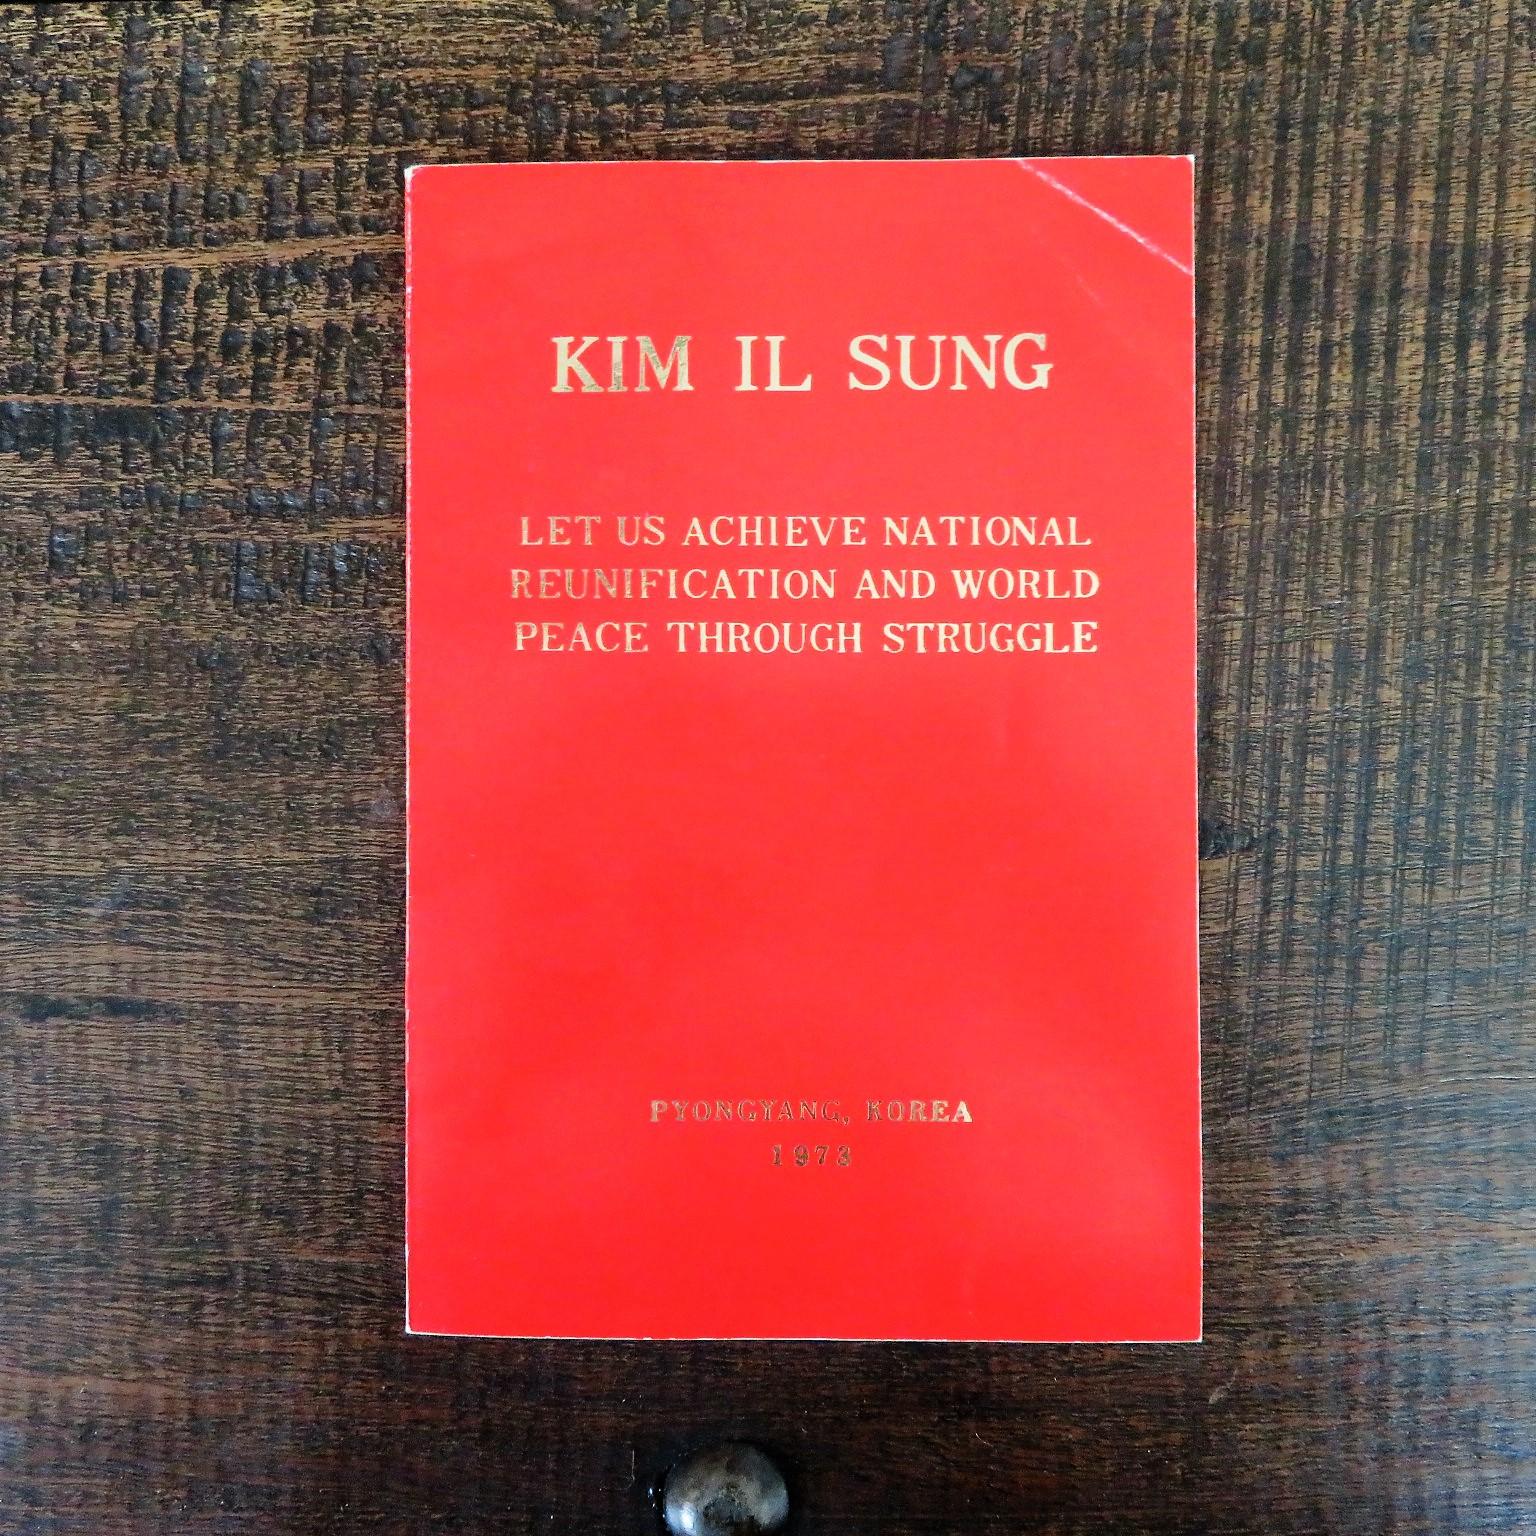 north-korea-book-1-4